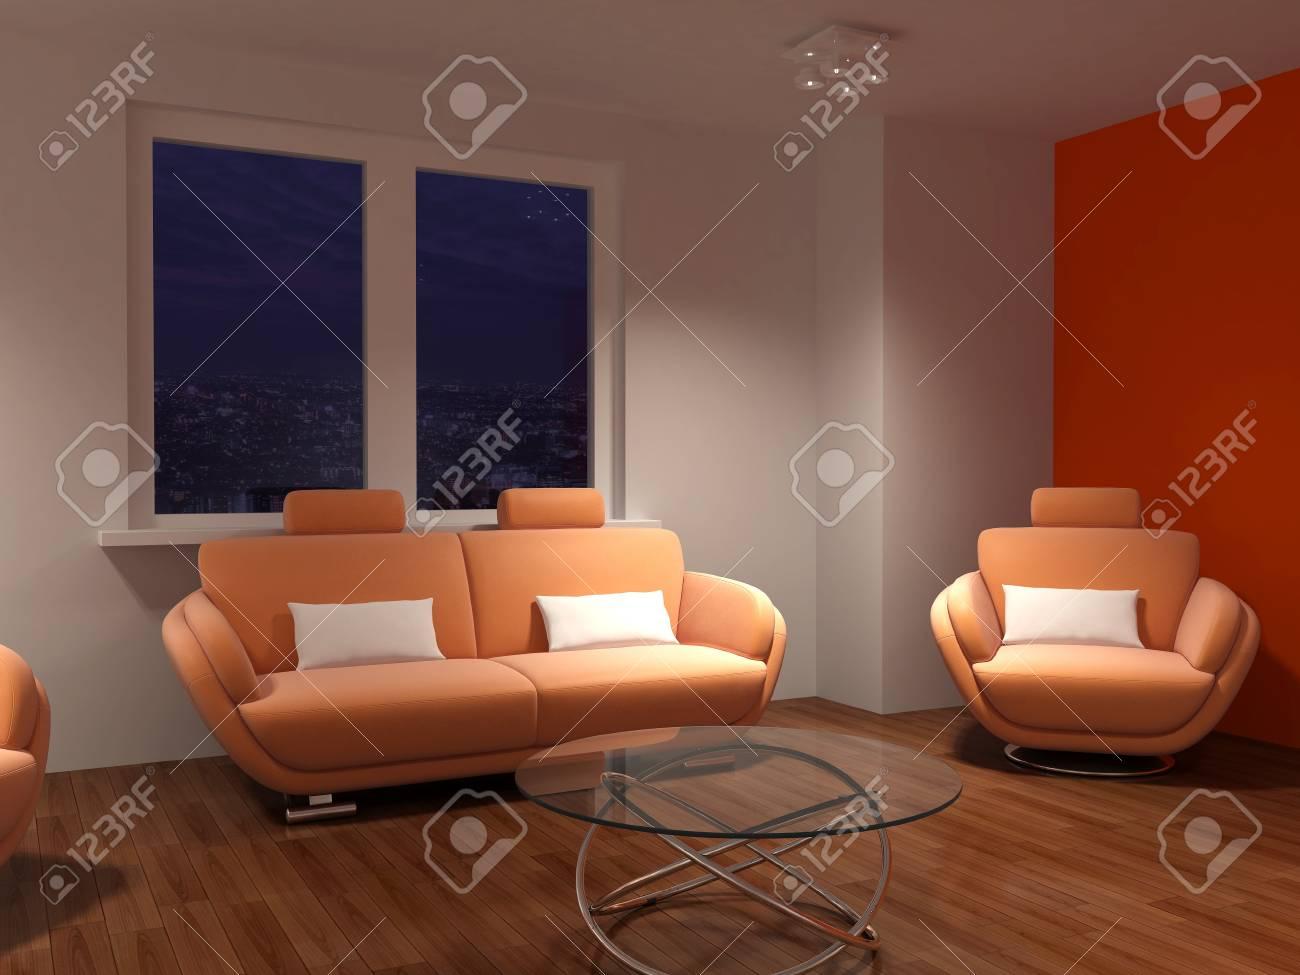 Modern Interieur Woonkamer : Hoge resolutie afbeelding interieur d illustration modern